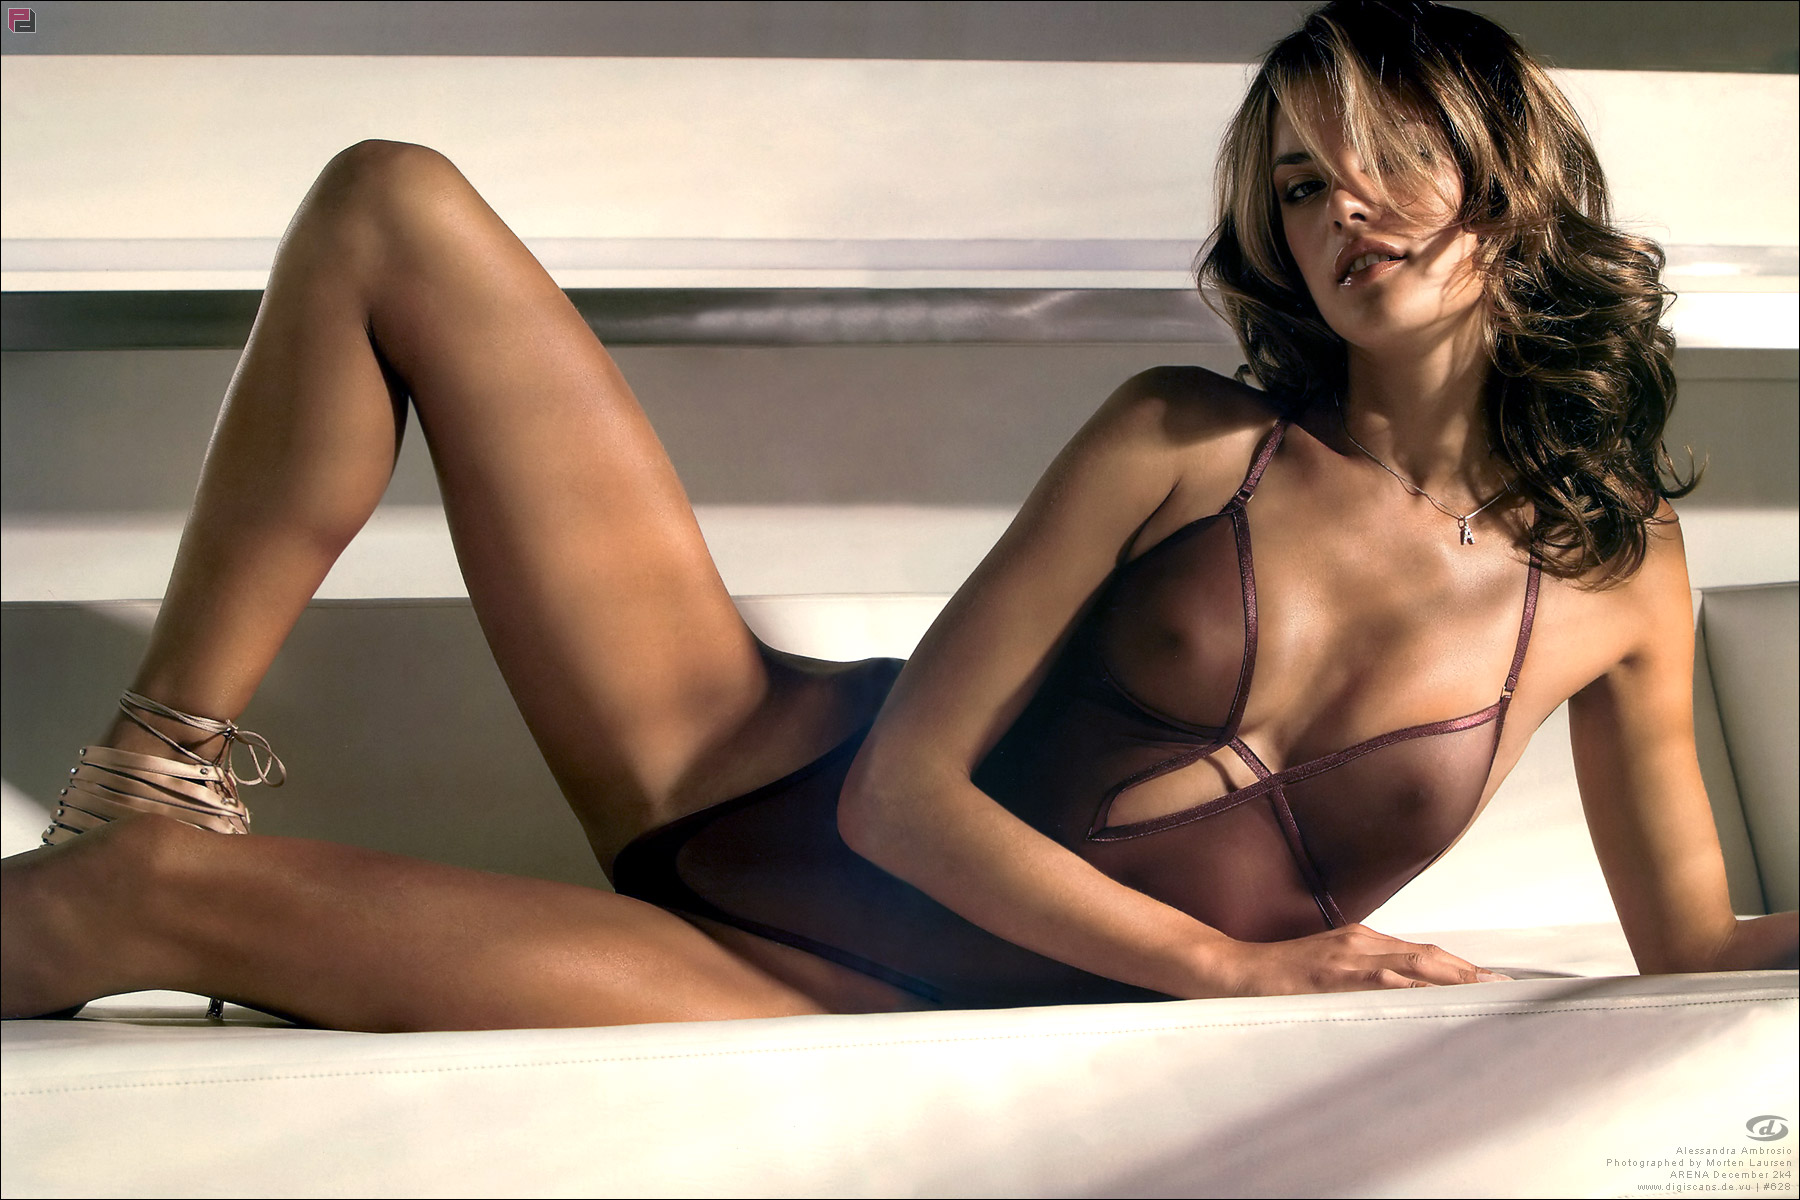 Alessandra Ambrosio - breasts